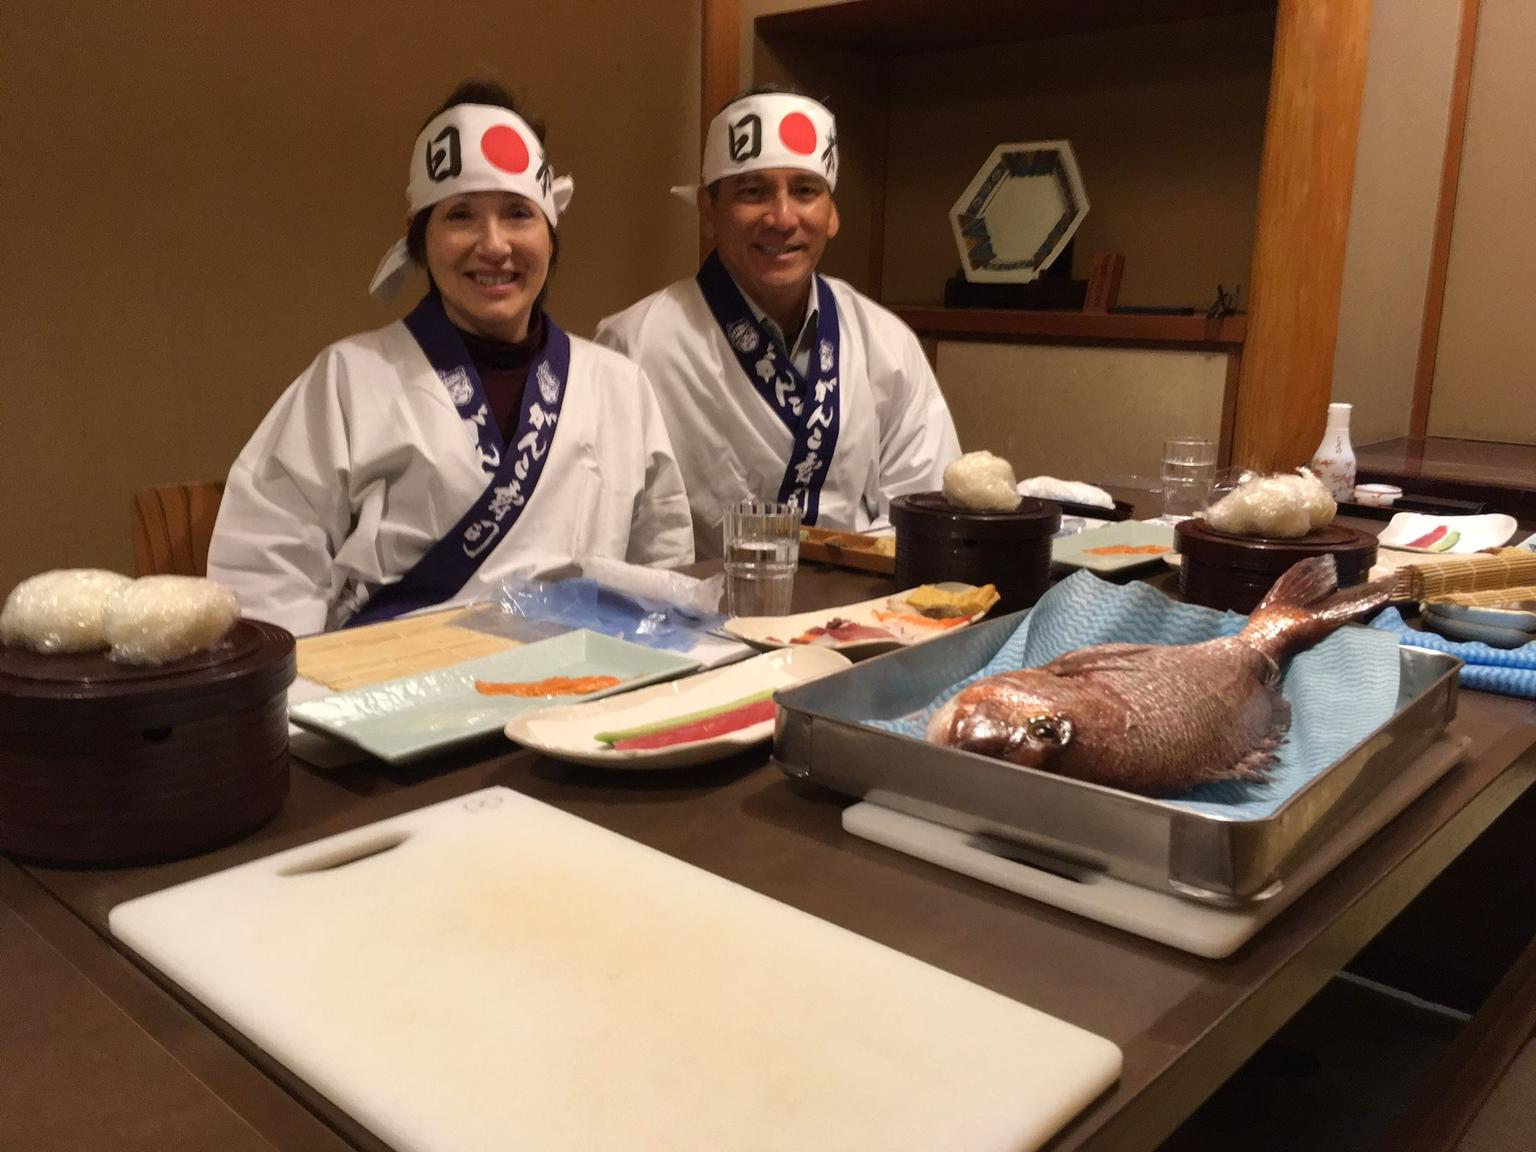 MÁS FOTOS, Tsukiji Fish Market Visit with Sushi Making Experience